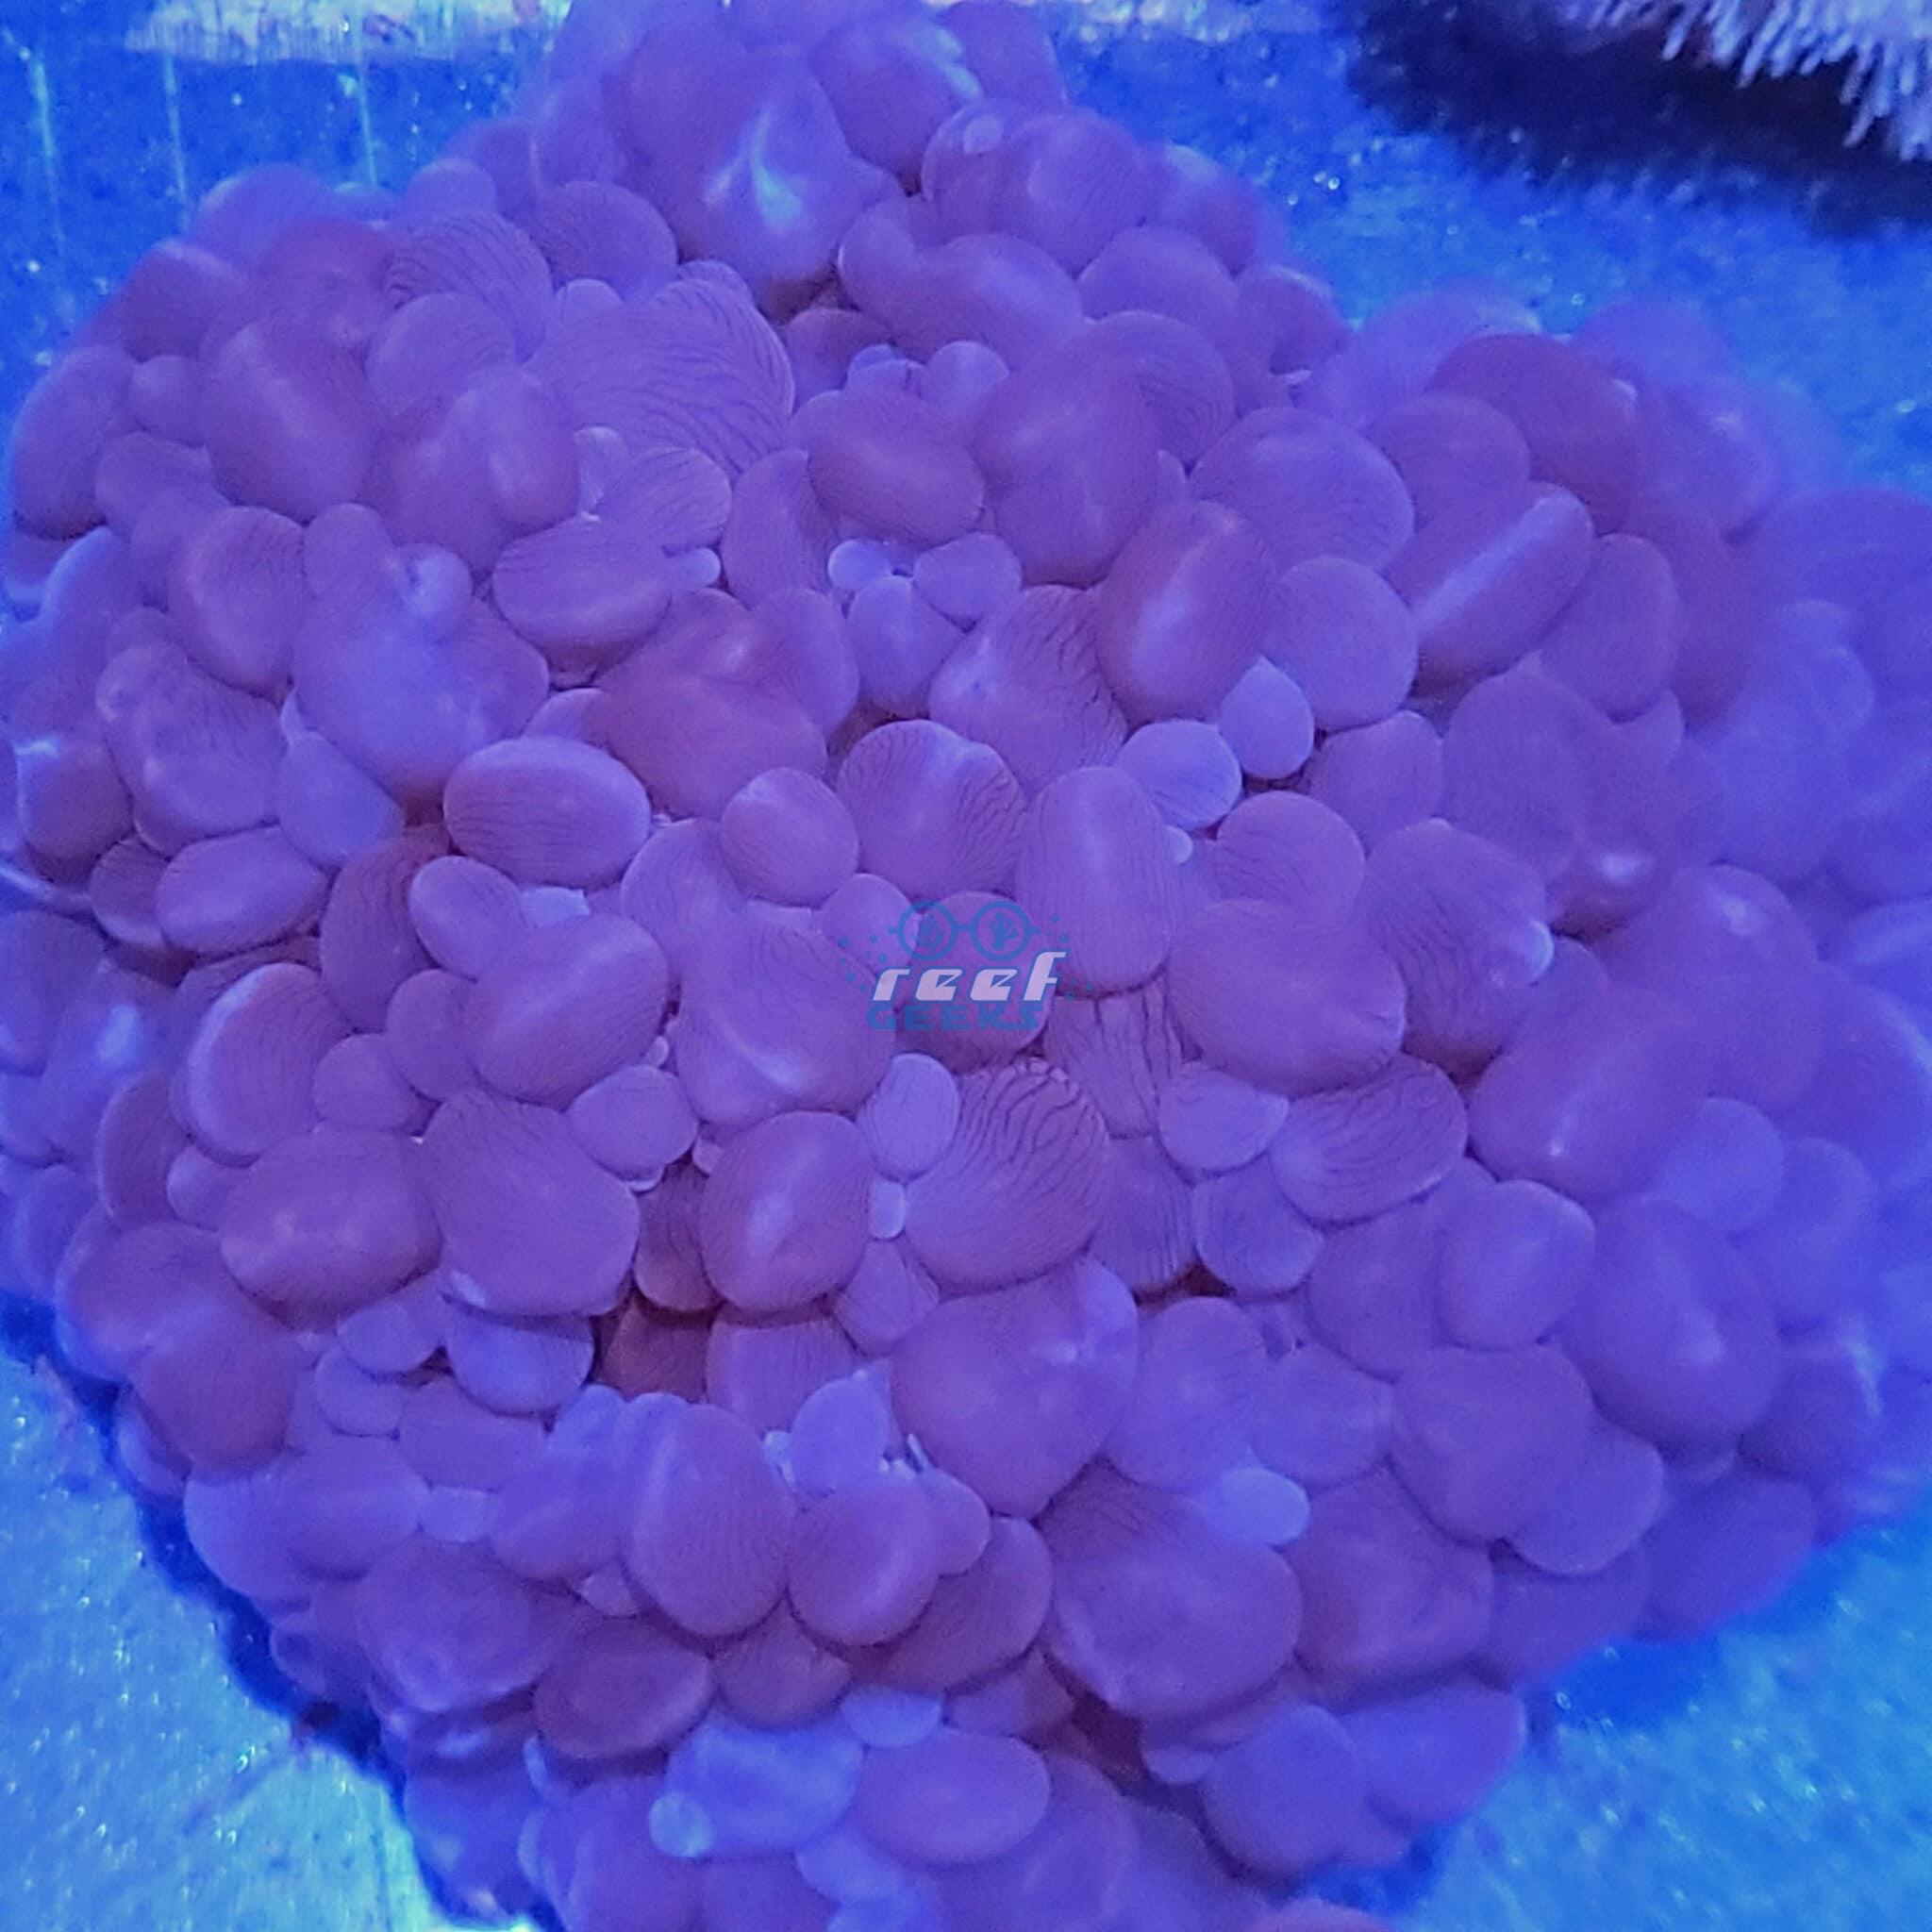 XXL Bubble Coral WYSIWYG